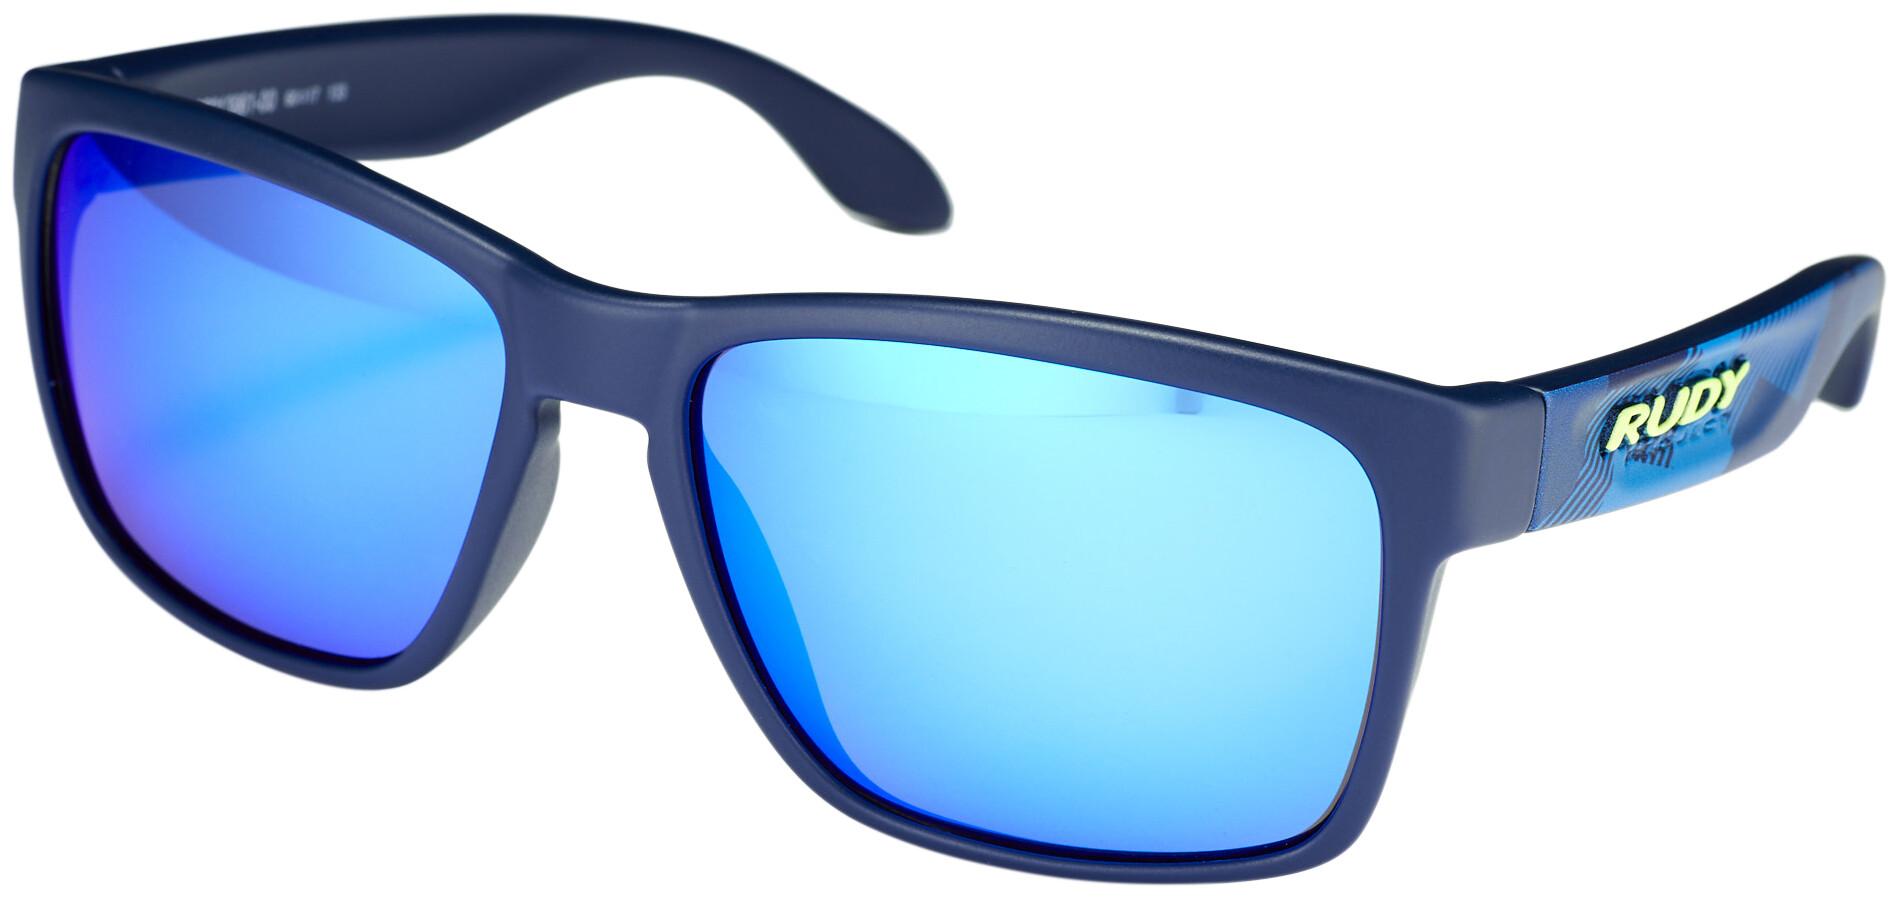 Rudy Project Spinhawk Cykelbriller, neo camo blue - rp optics multilaser blue (2020) | Glasses